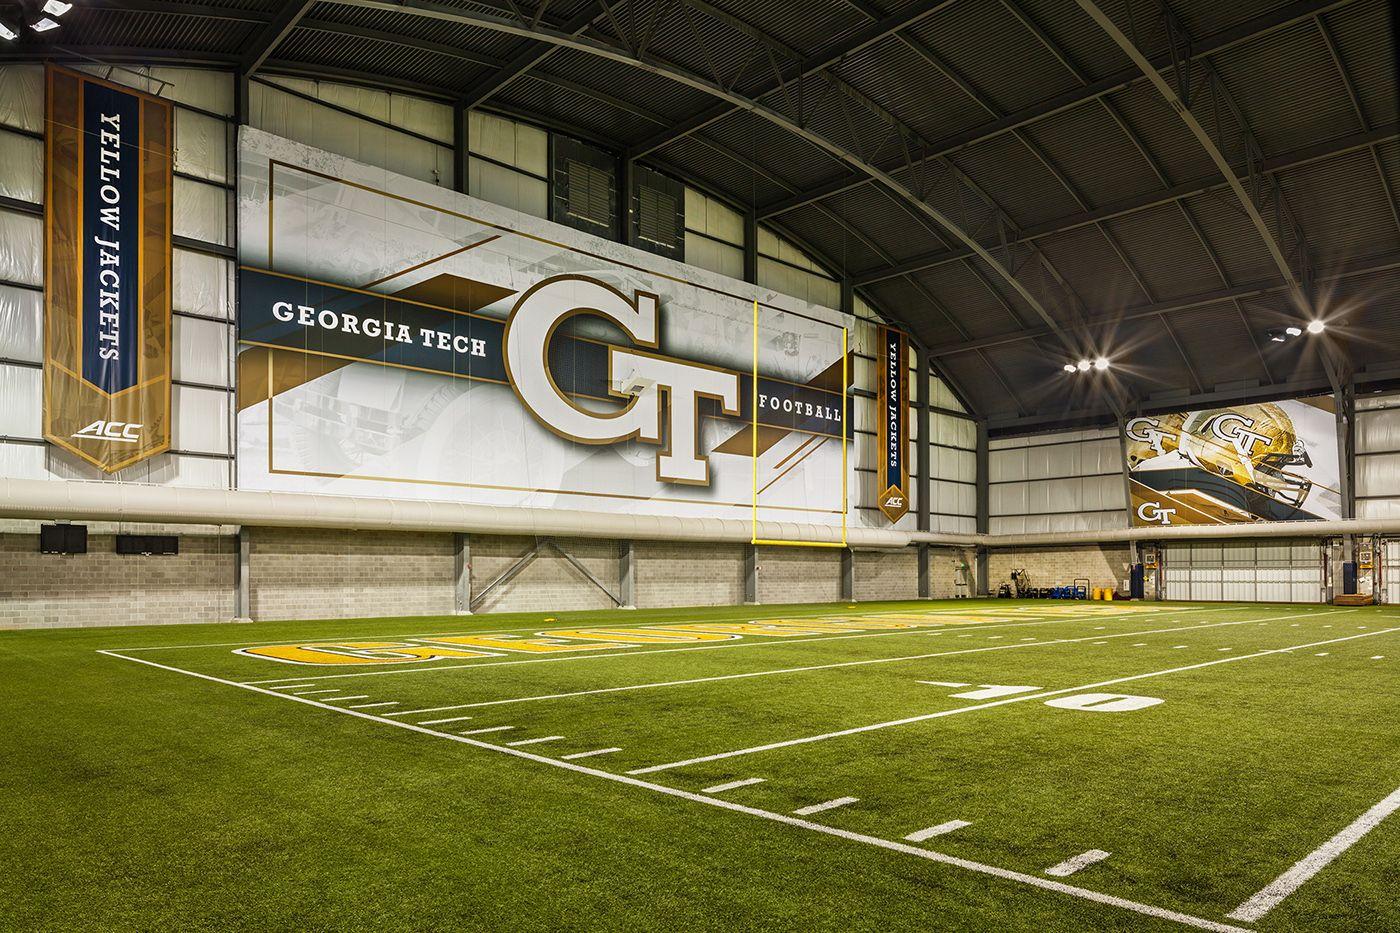 Georgia Tech Indoor Football Facility On Behance Georgia Tech Football Facility